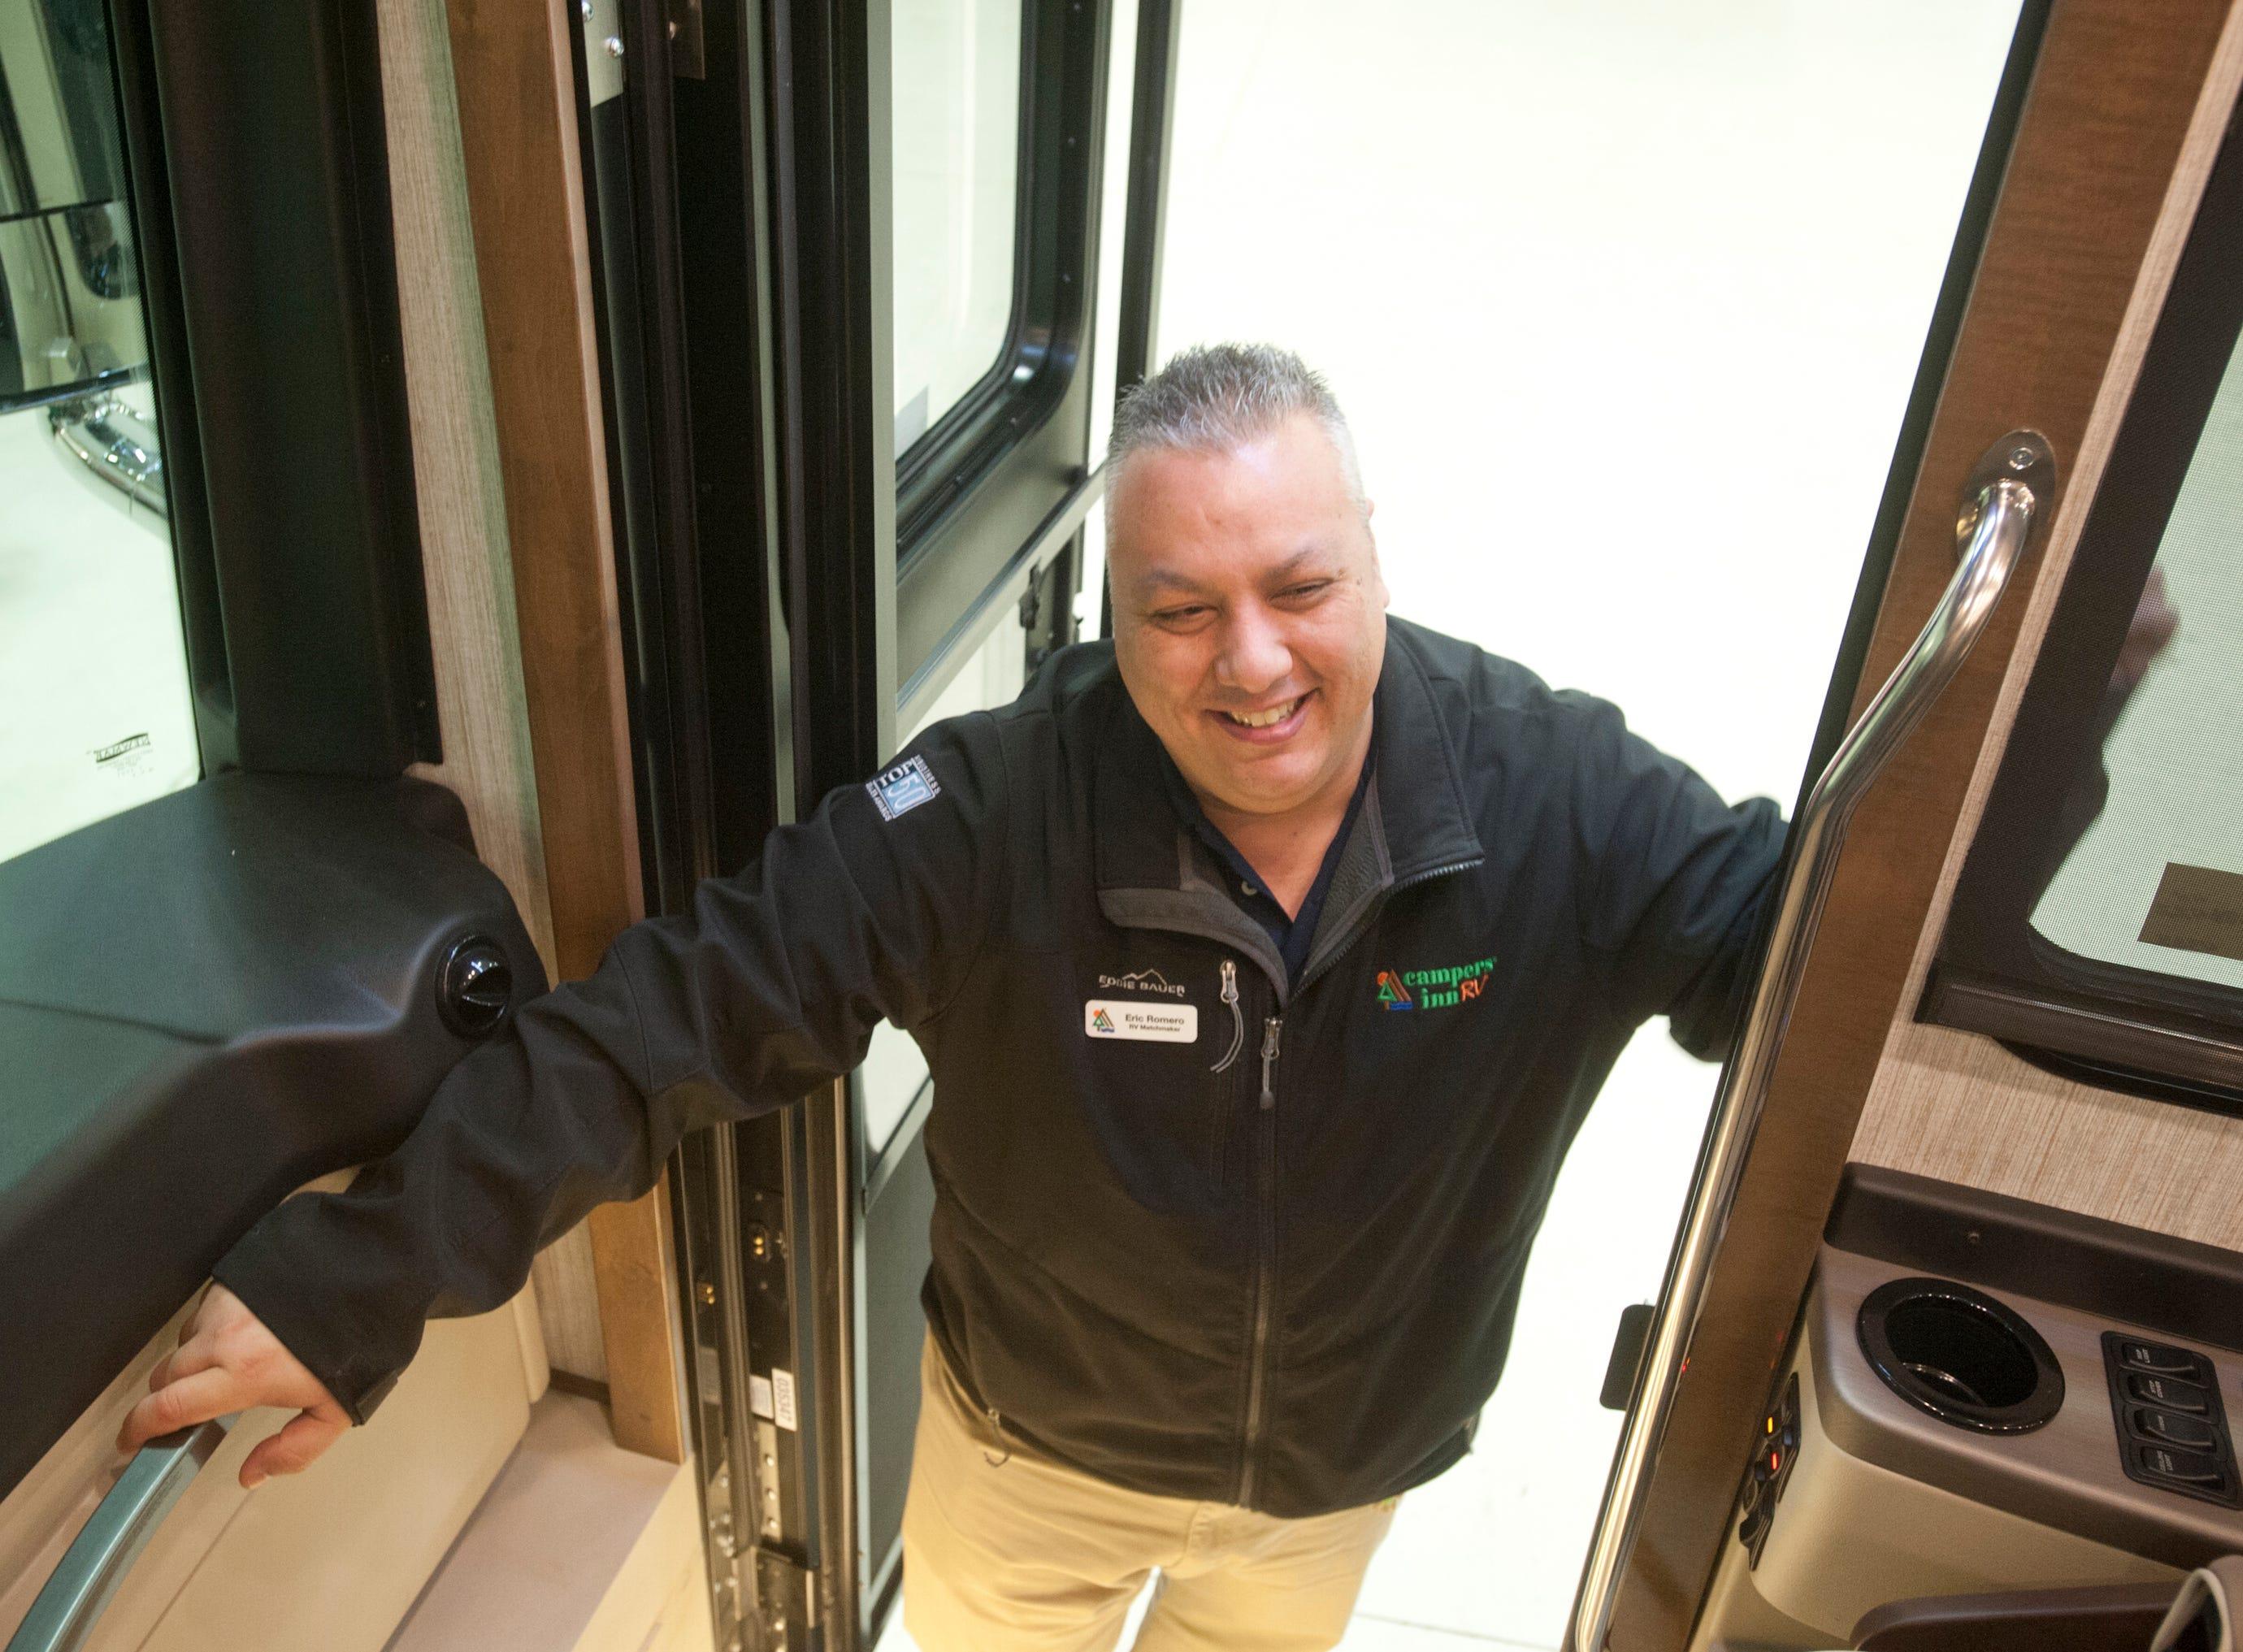 Eric Romero, sales representative for Campers Inn in Clarksville, climbs aboard the Dutch Star11 December 2018